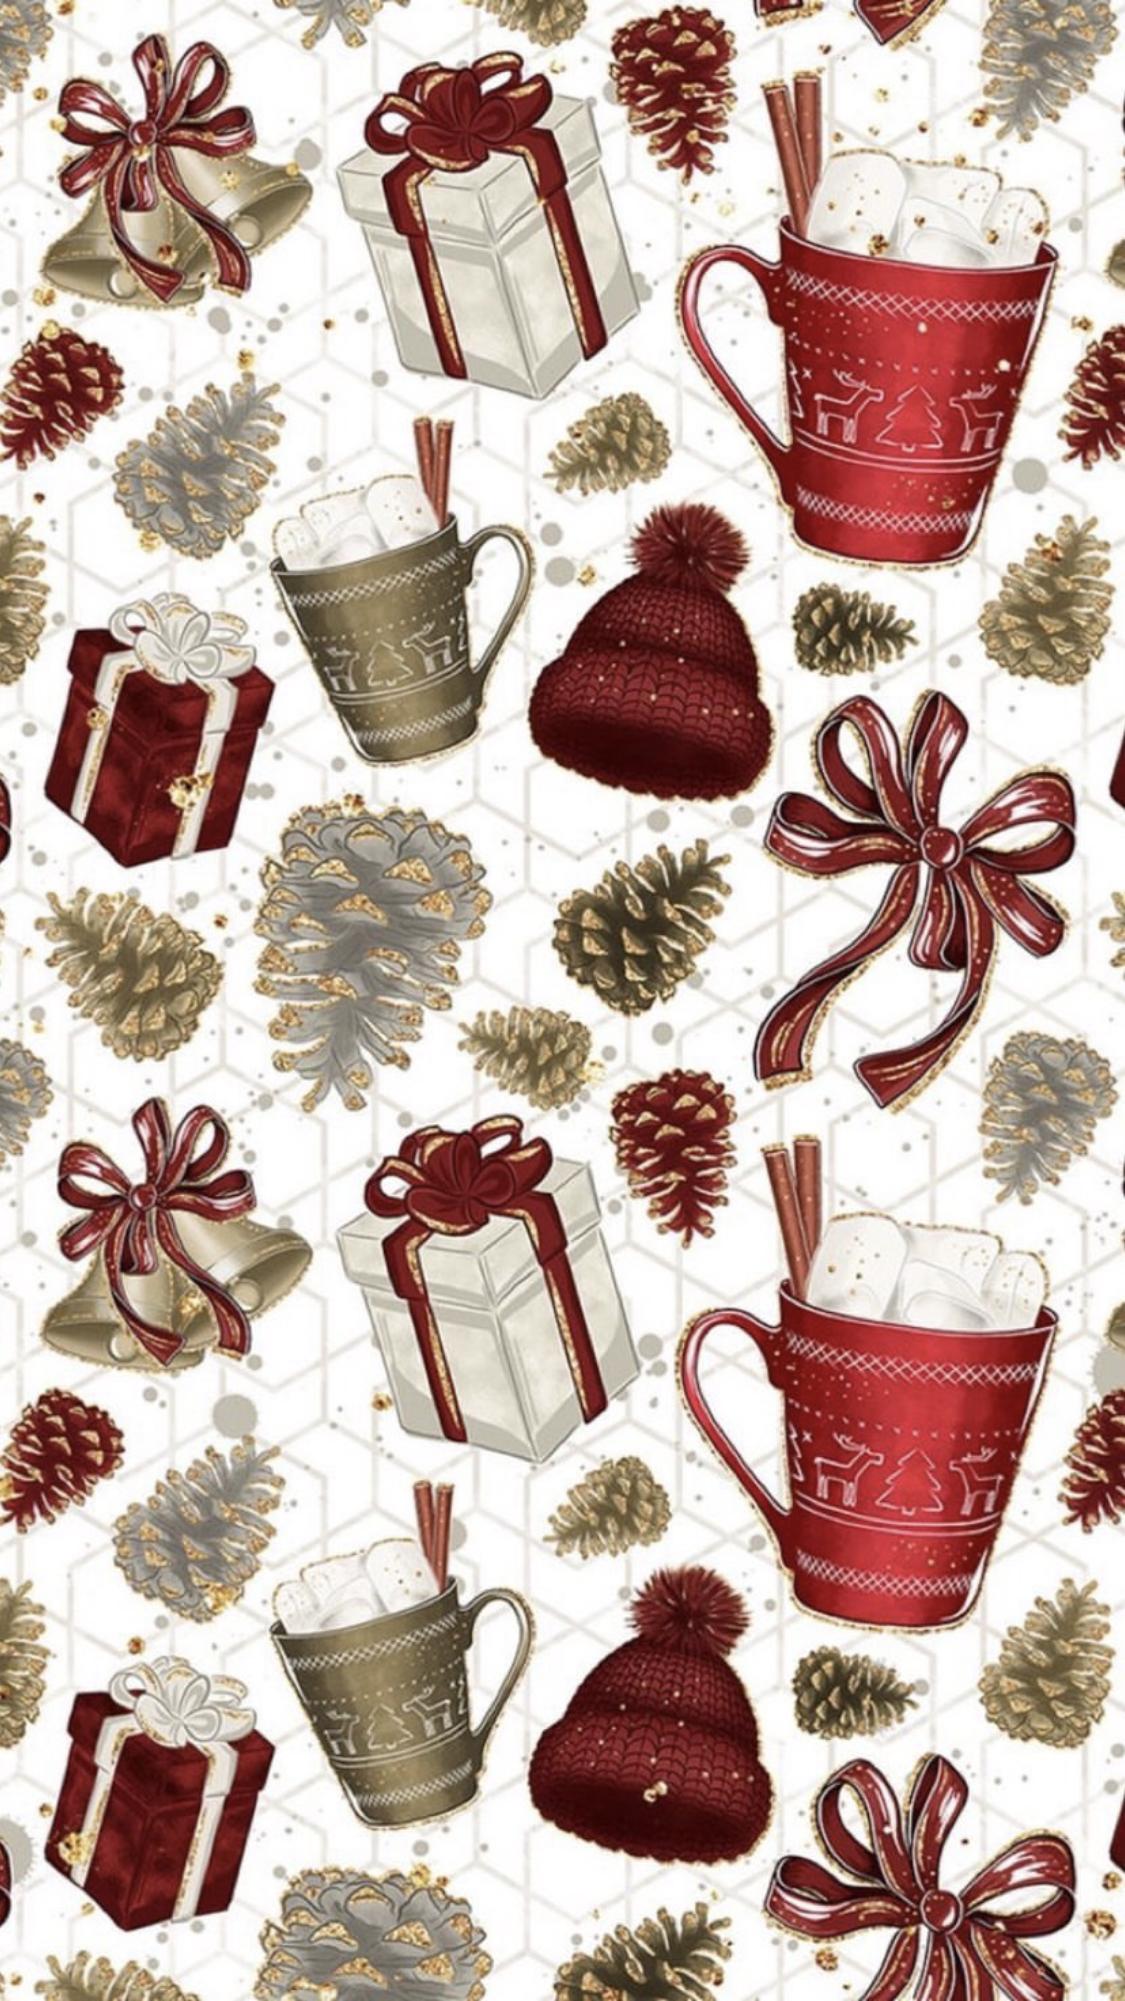 Cozy Christmas In 2020 Cute Christmas Wallpaper Wallpaper Iphone Christmas Christmas Wallpaper